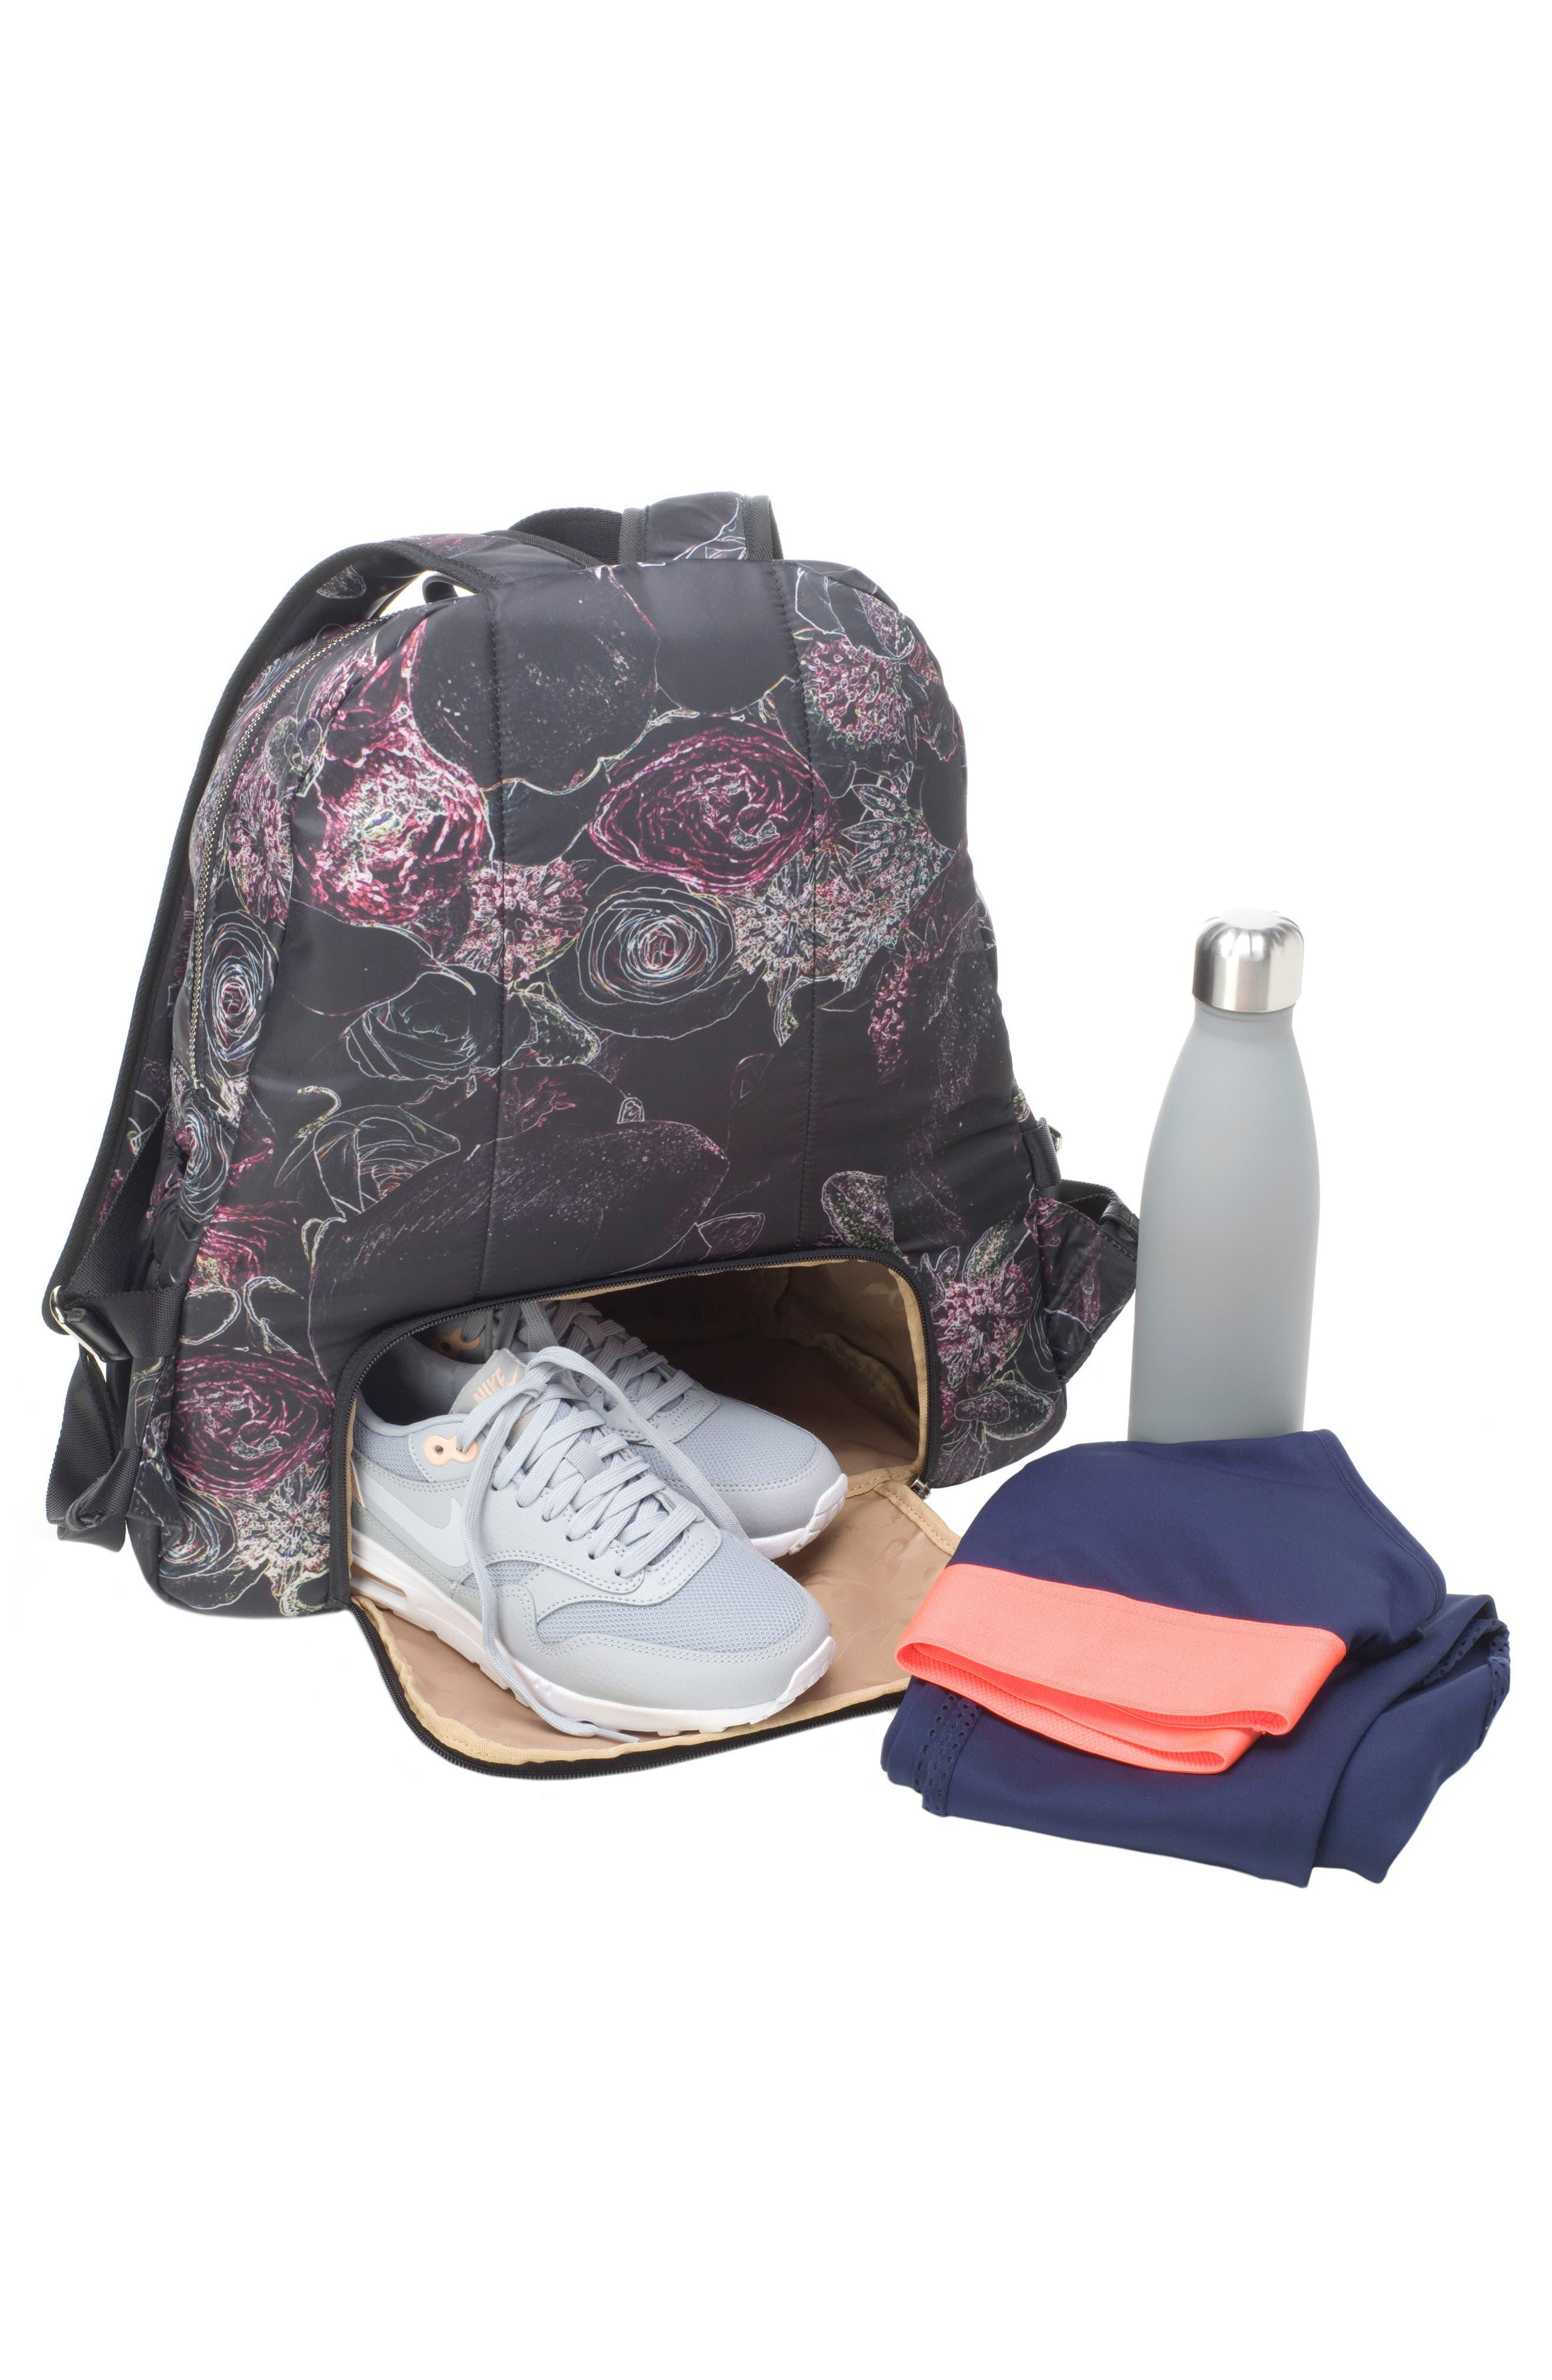 Hero Water Resistant Nylon Backpack Diaper Bag,                             Alternate thumbnail 14, color,                             Neon Floral